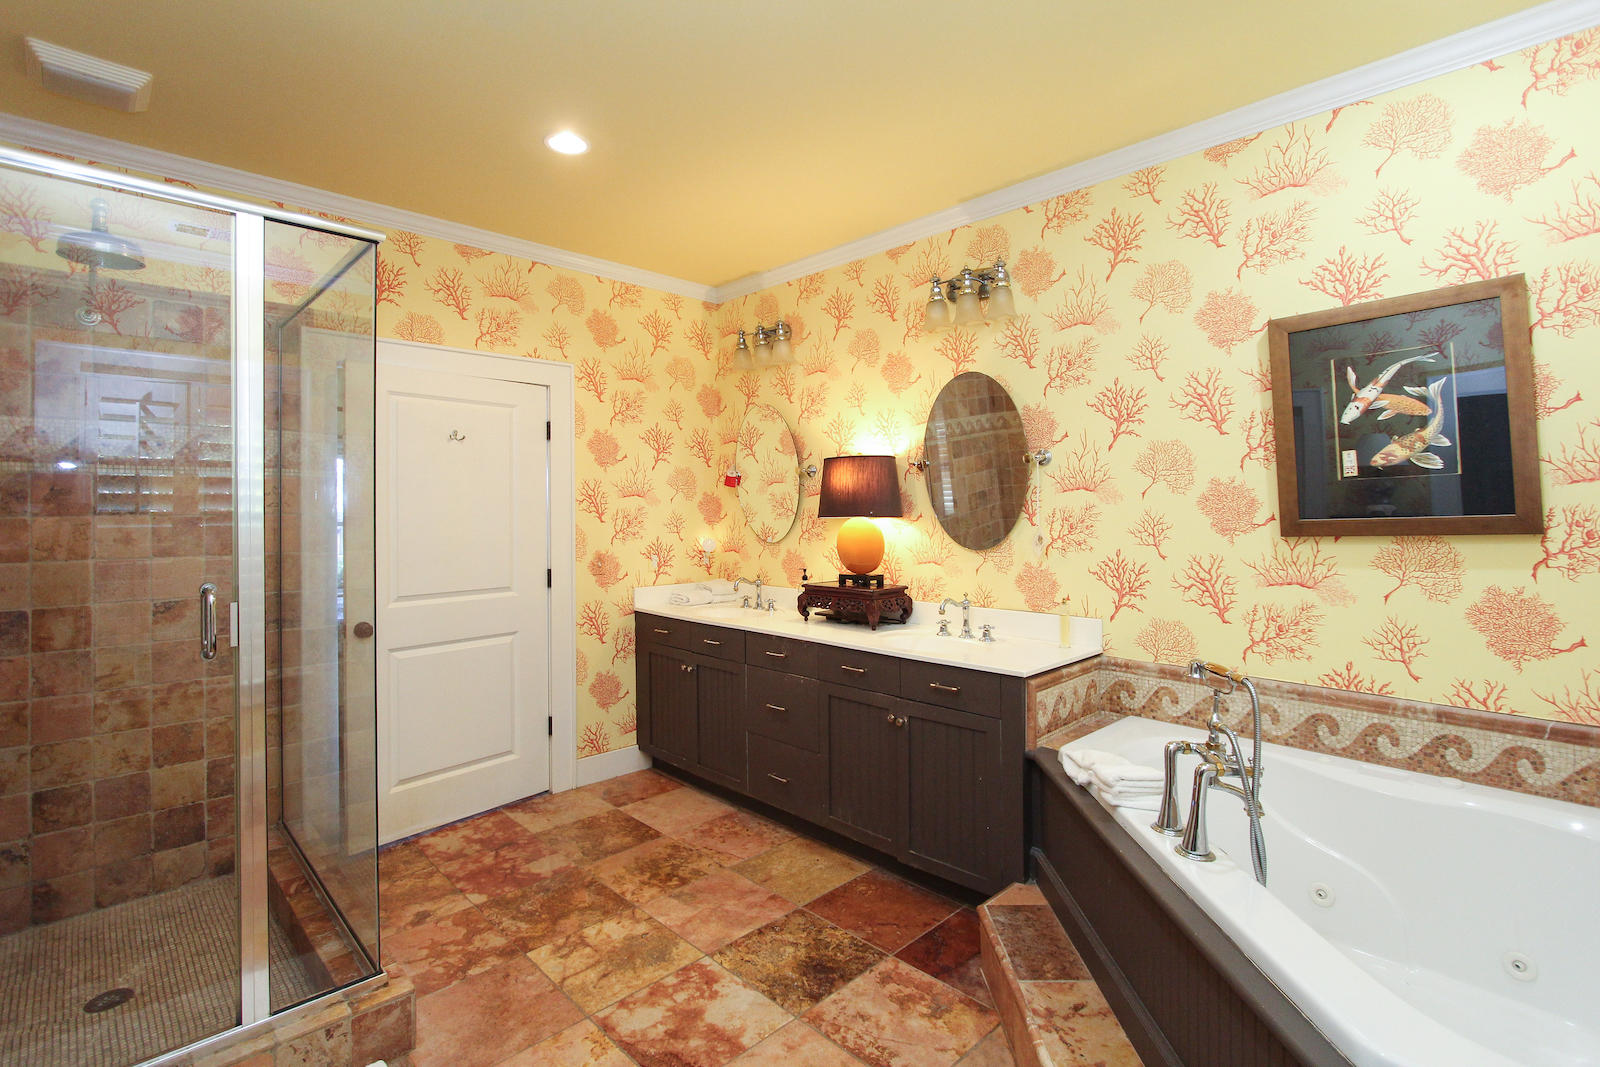 Albemarle Point Homes For Sale - 3 Albemarle, Charleston, SC - 15